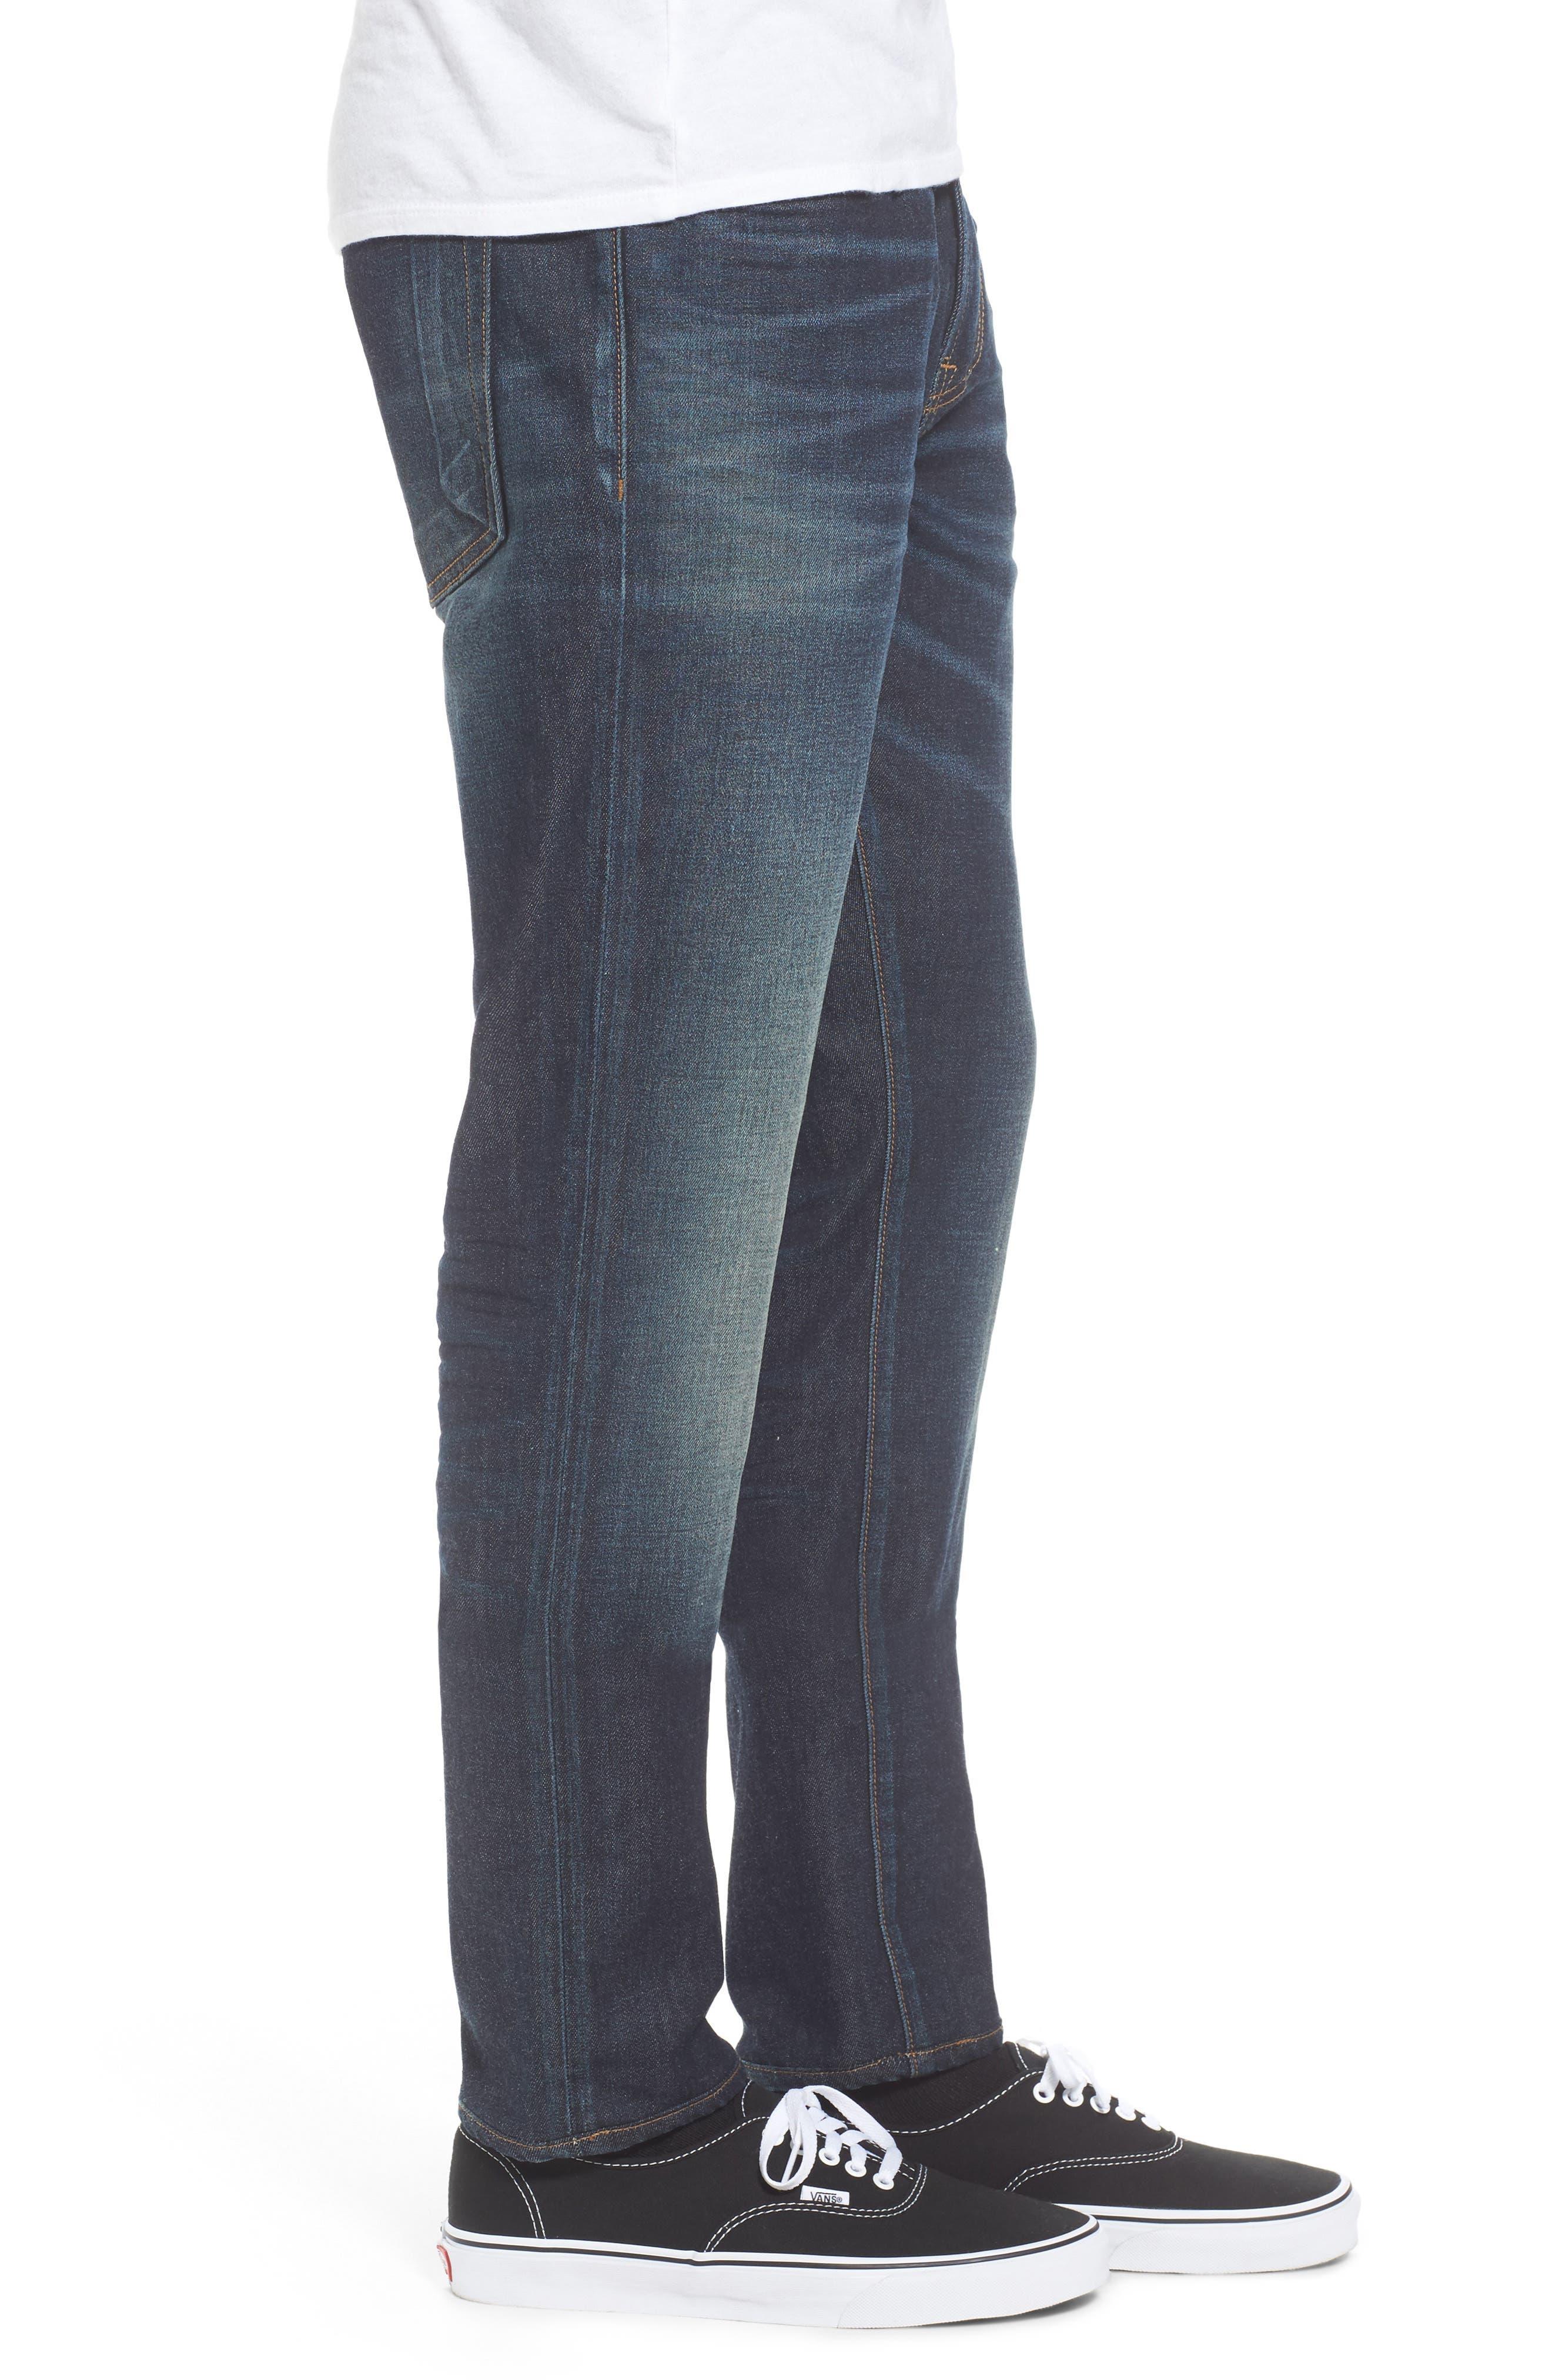 Windsor Slim Fit Jeans,                             Alternate thumbnail 3, color,                             Medium